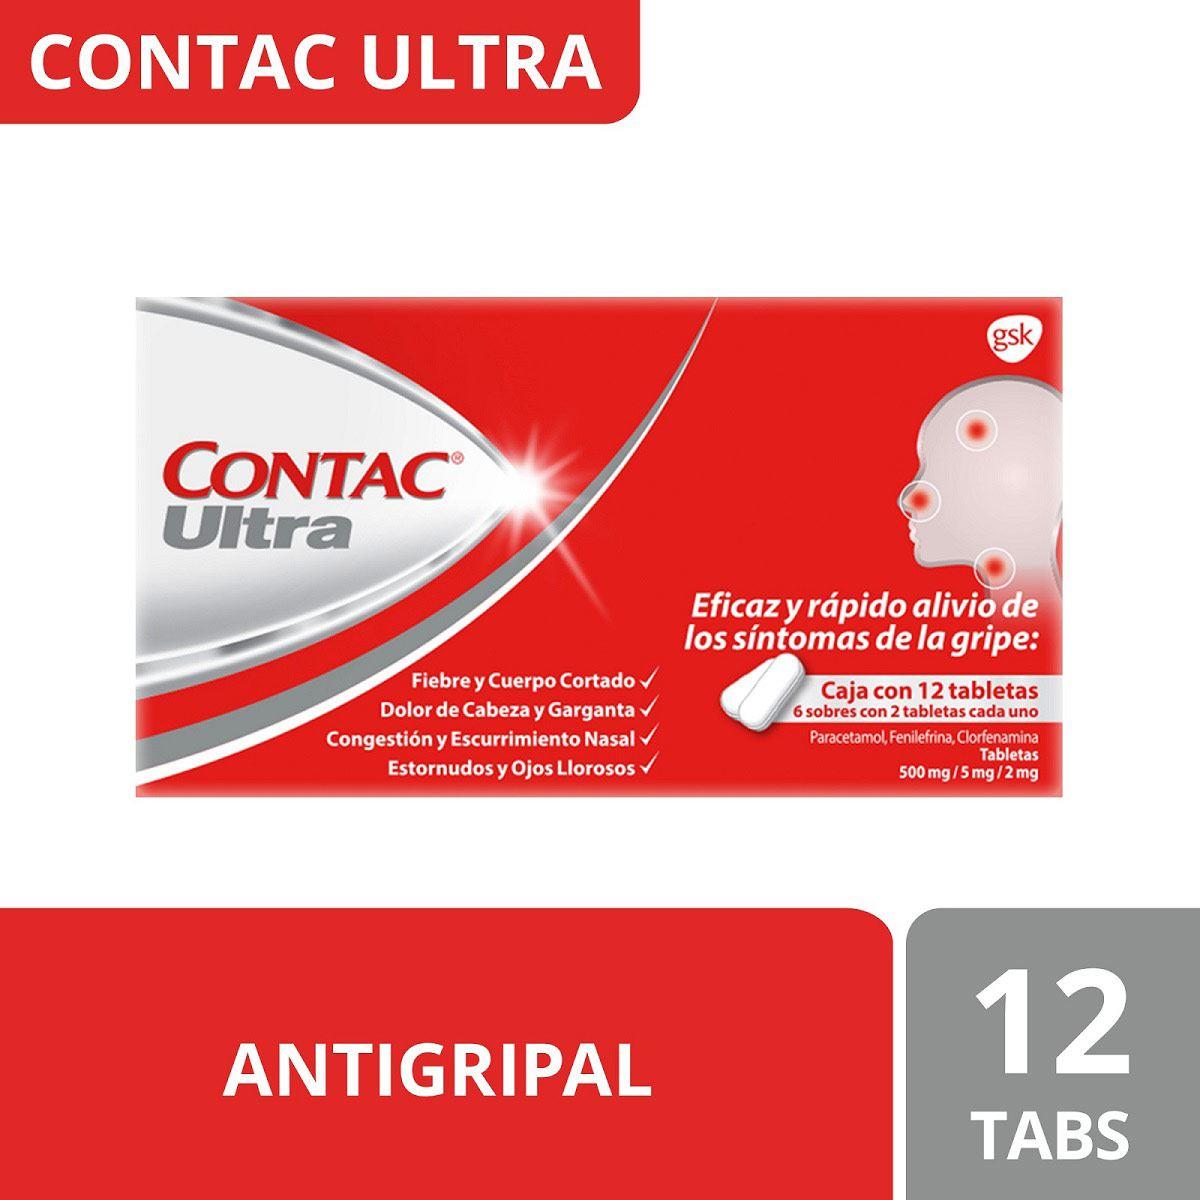 Contac Ultra